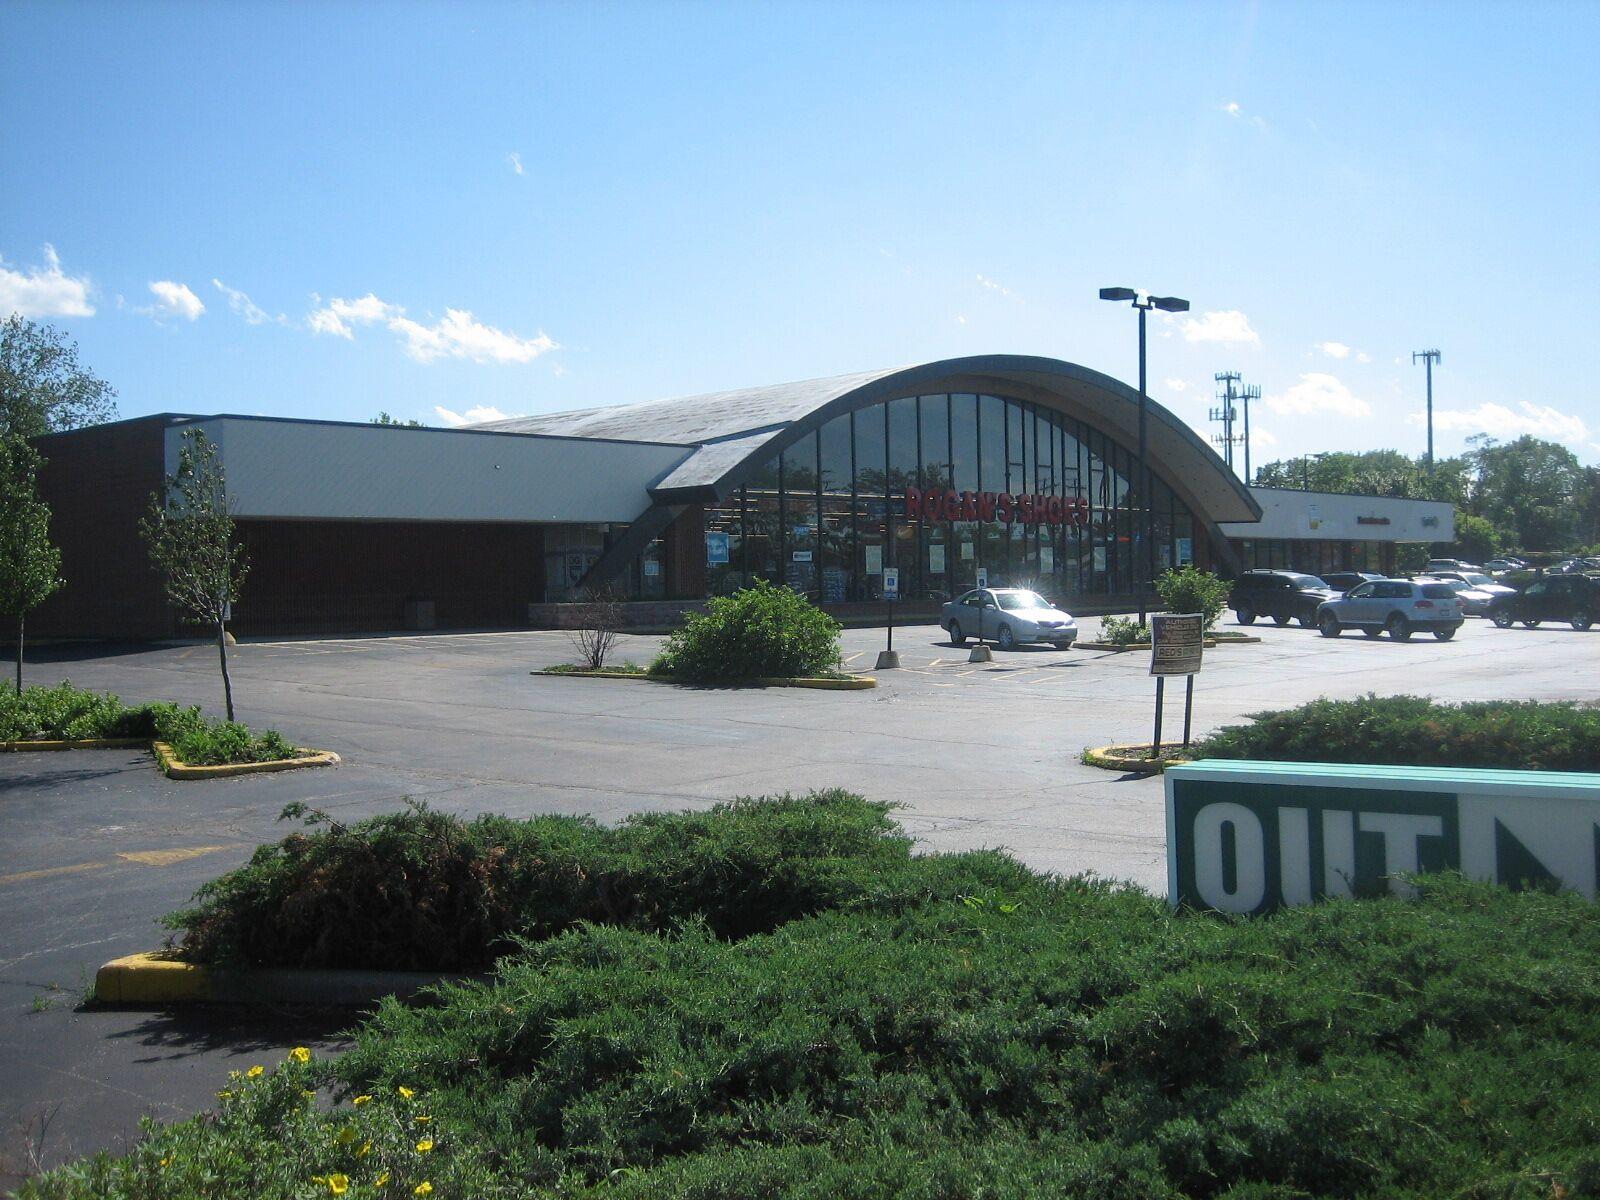 15-45 E. Dundee Rd. Buffalo Grove, IL